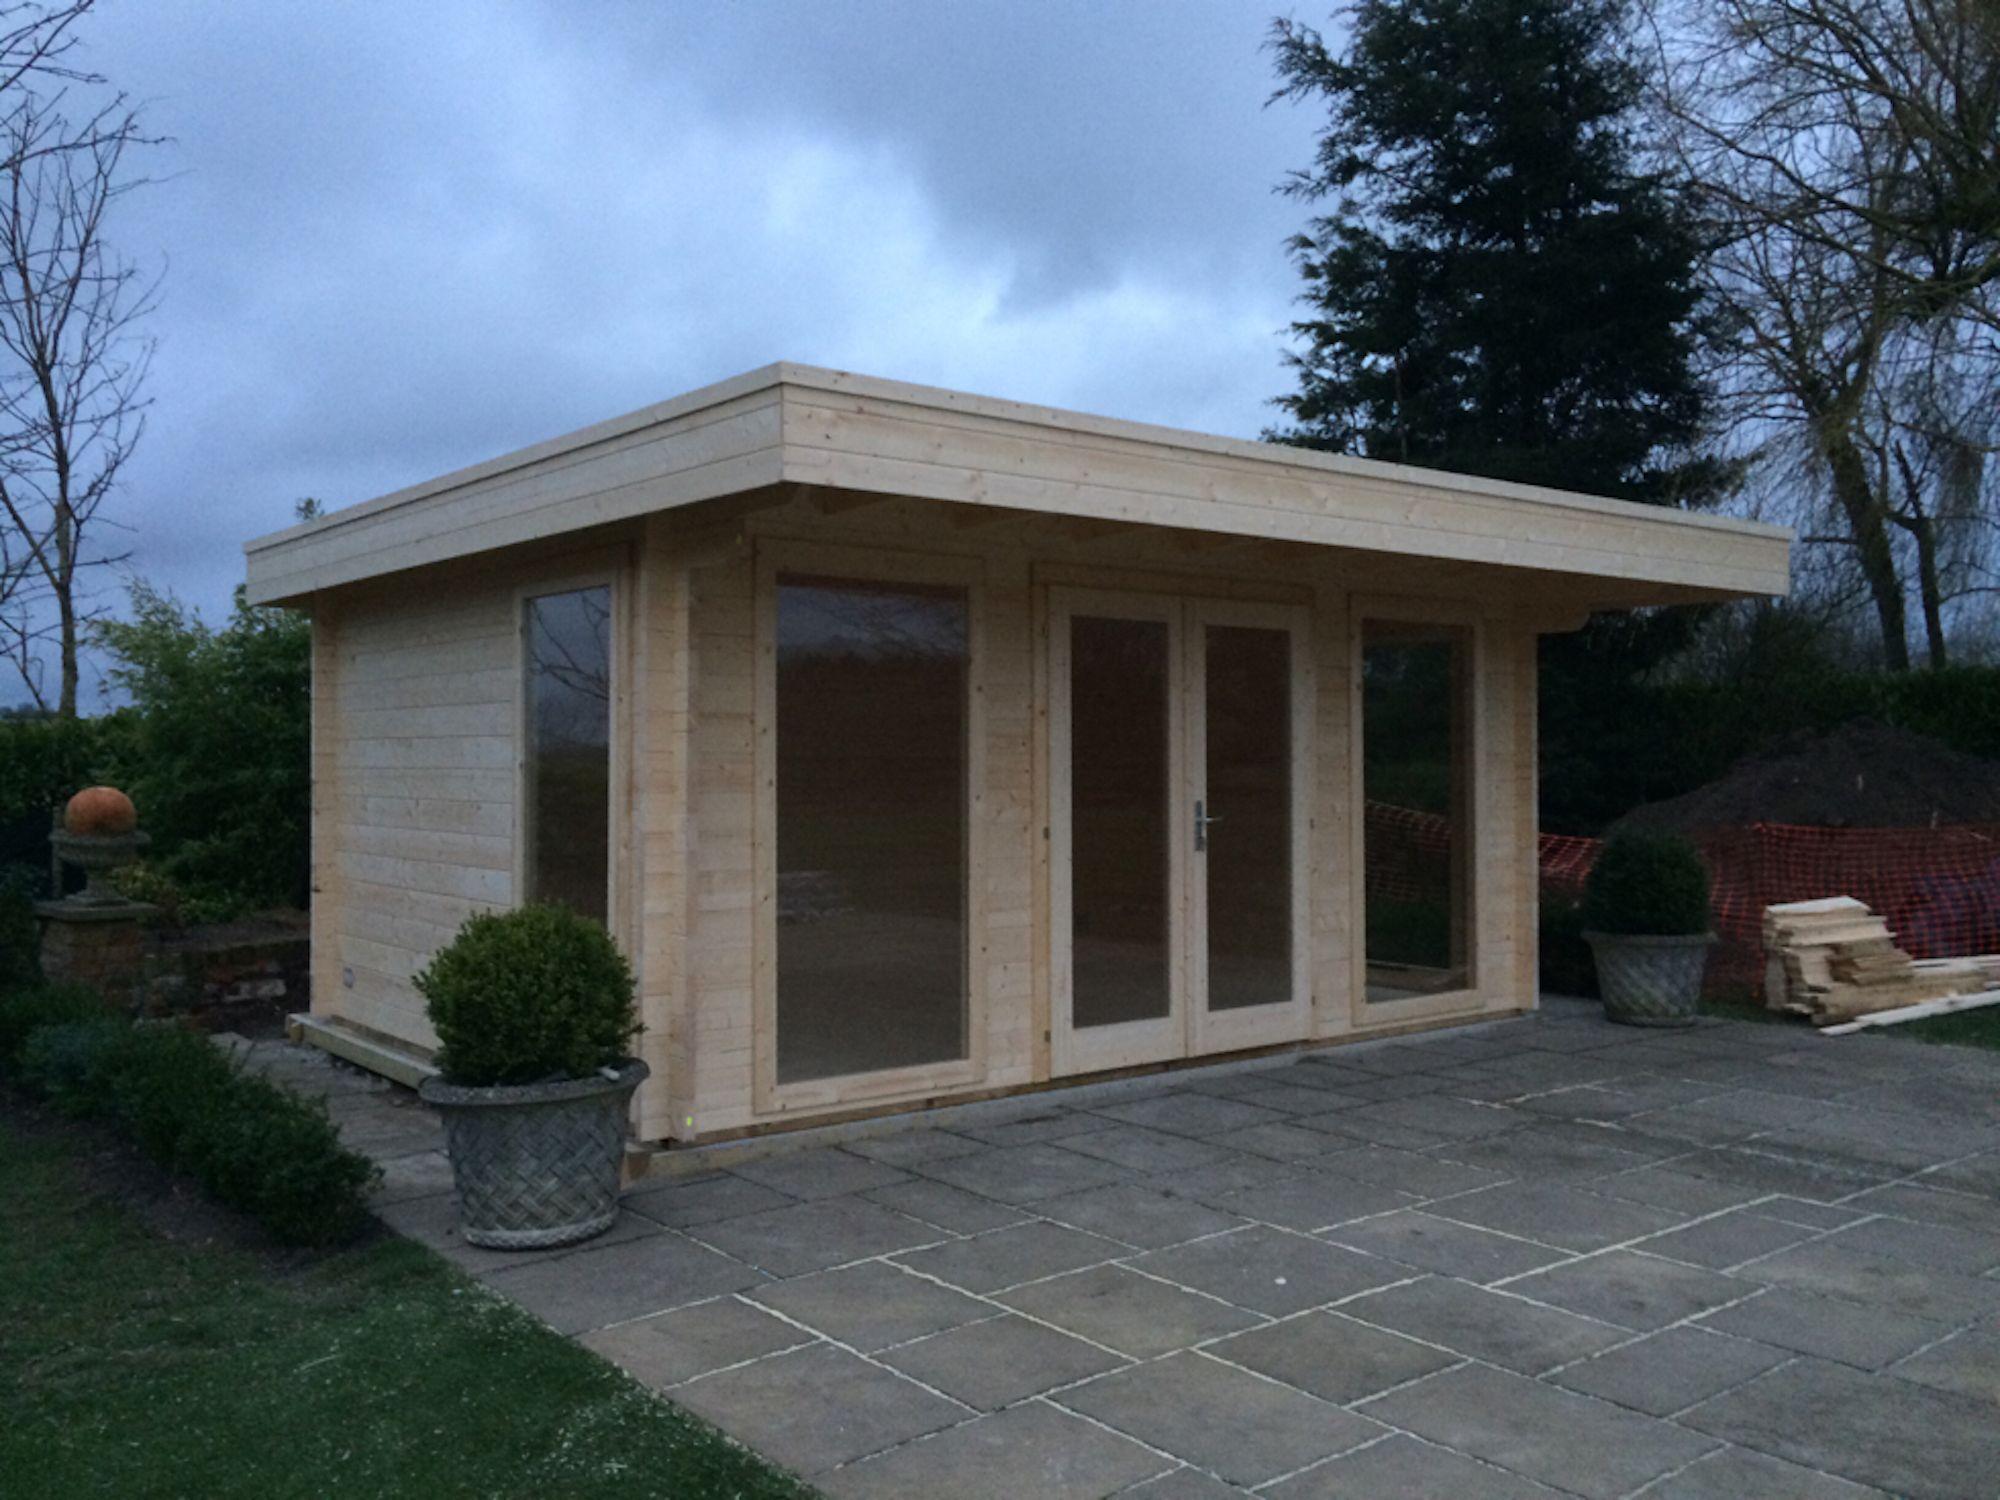 Garden Office Log Cabin - Yorick 5x3.8m | Modern log ...